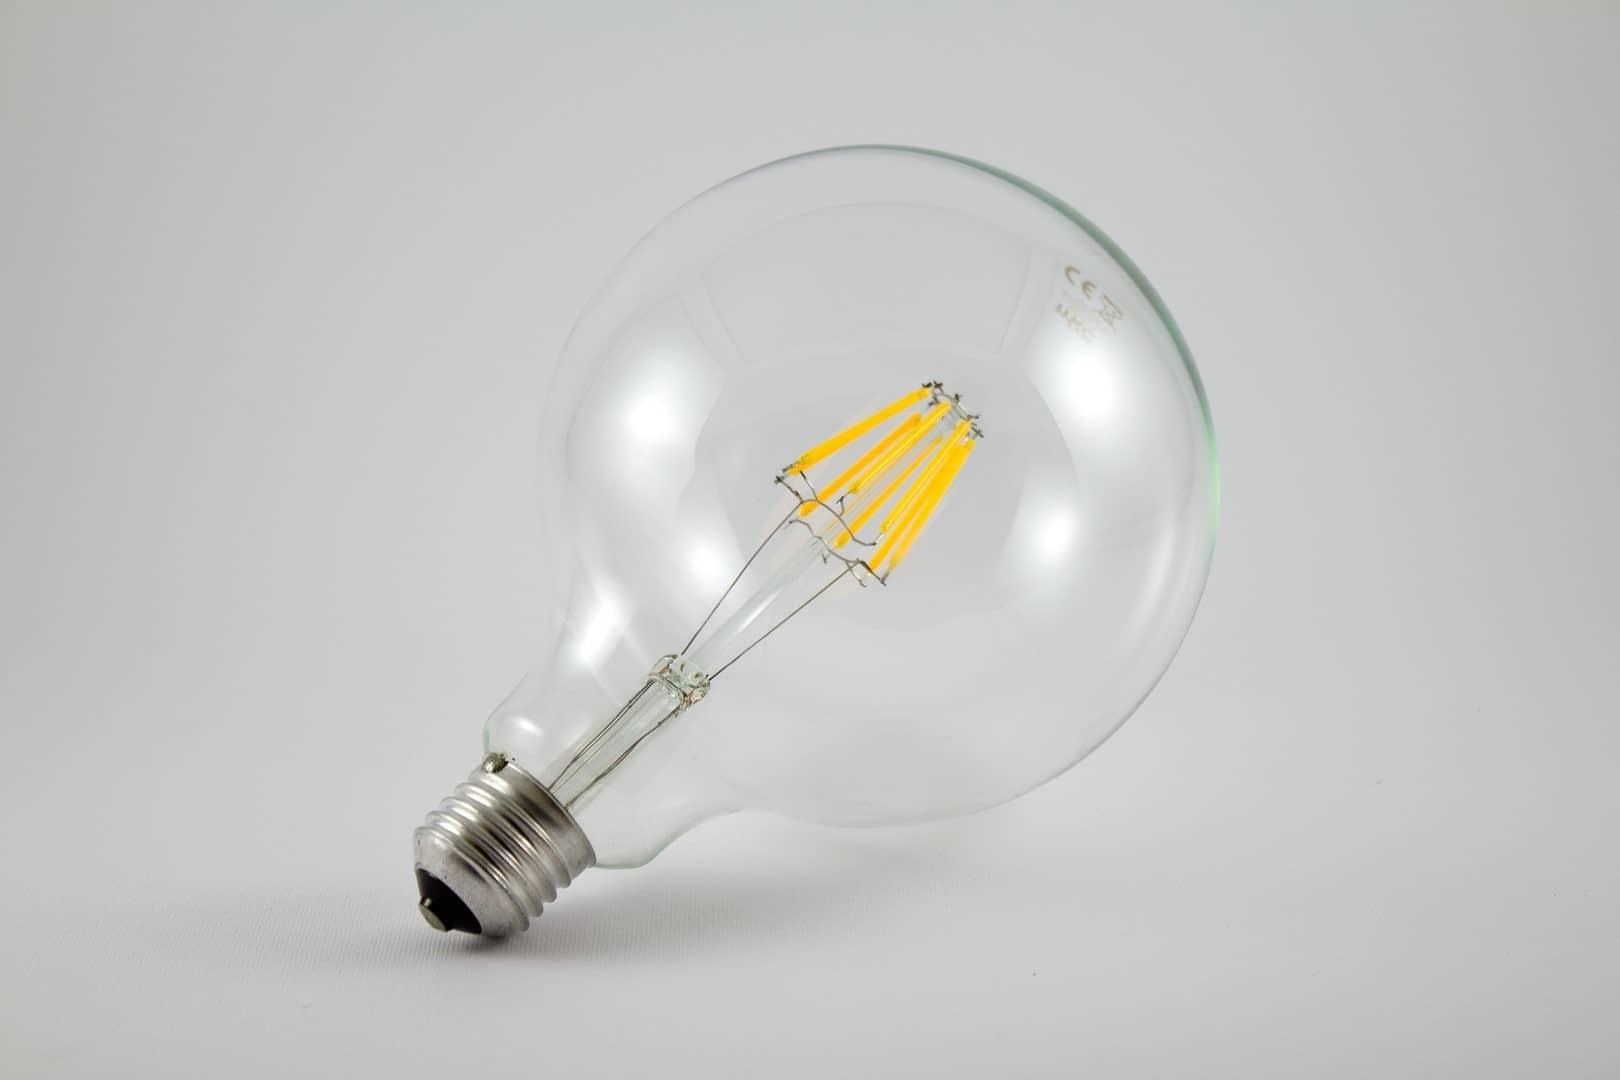 Bombillas LED: ¿Cuáles son las mejores de 2021?